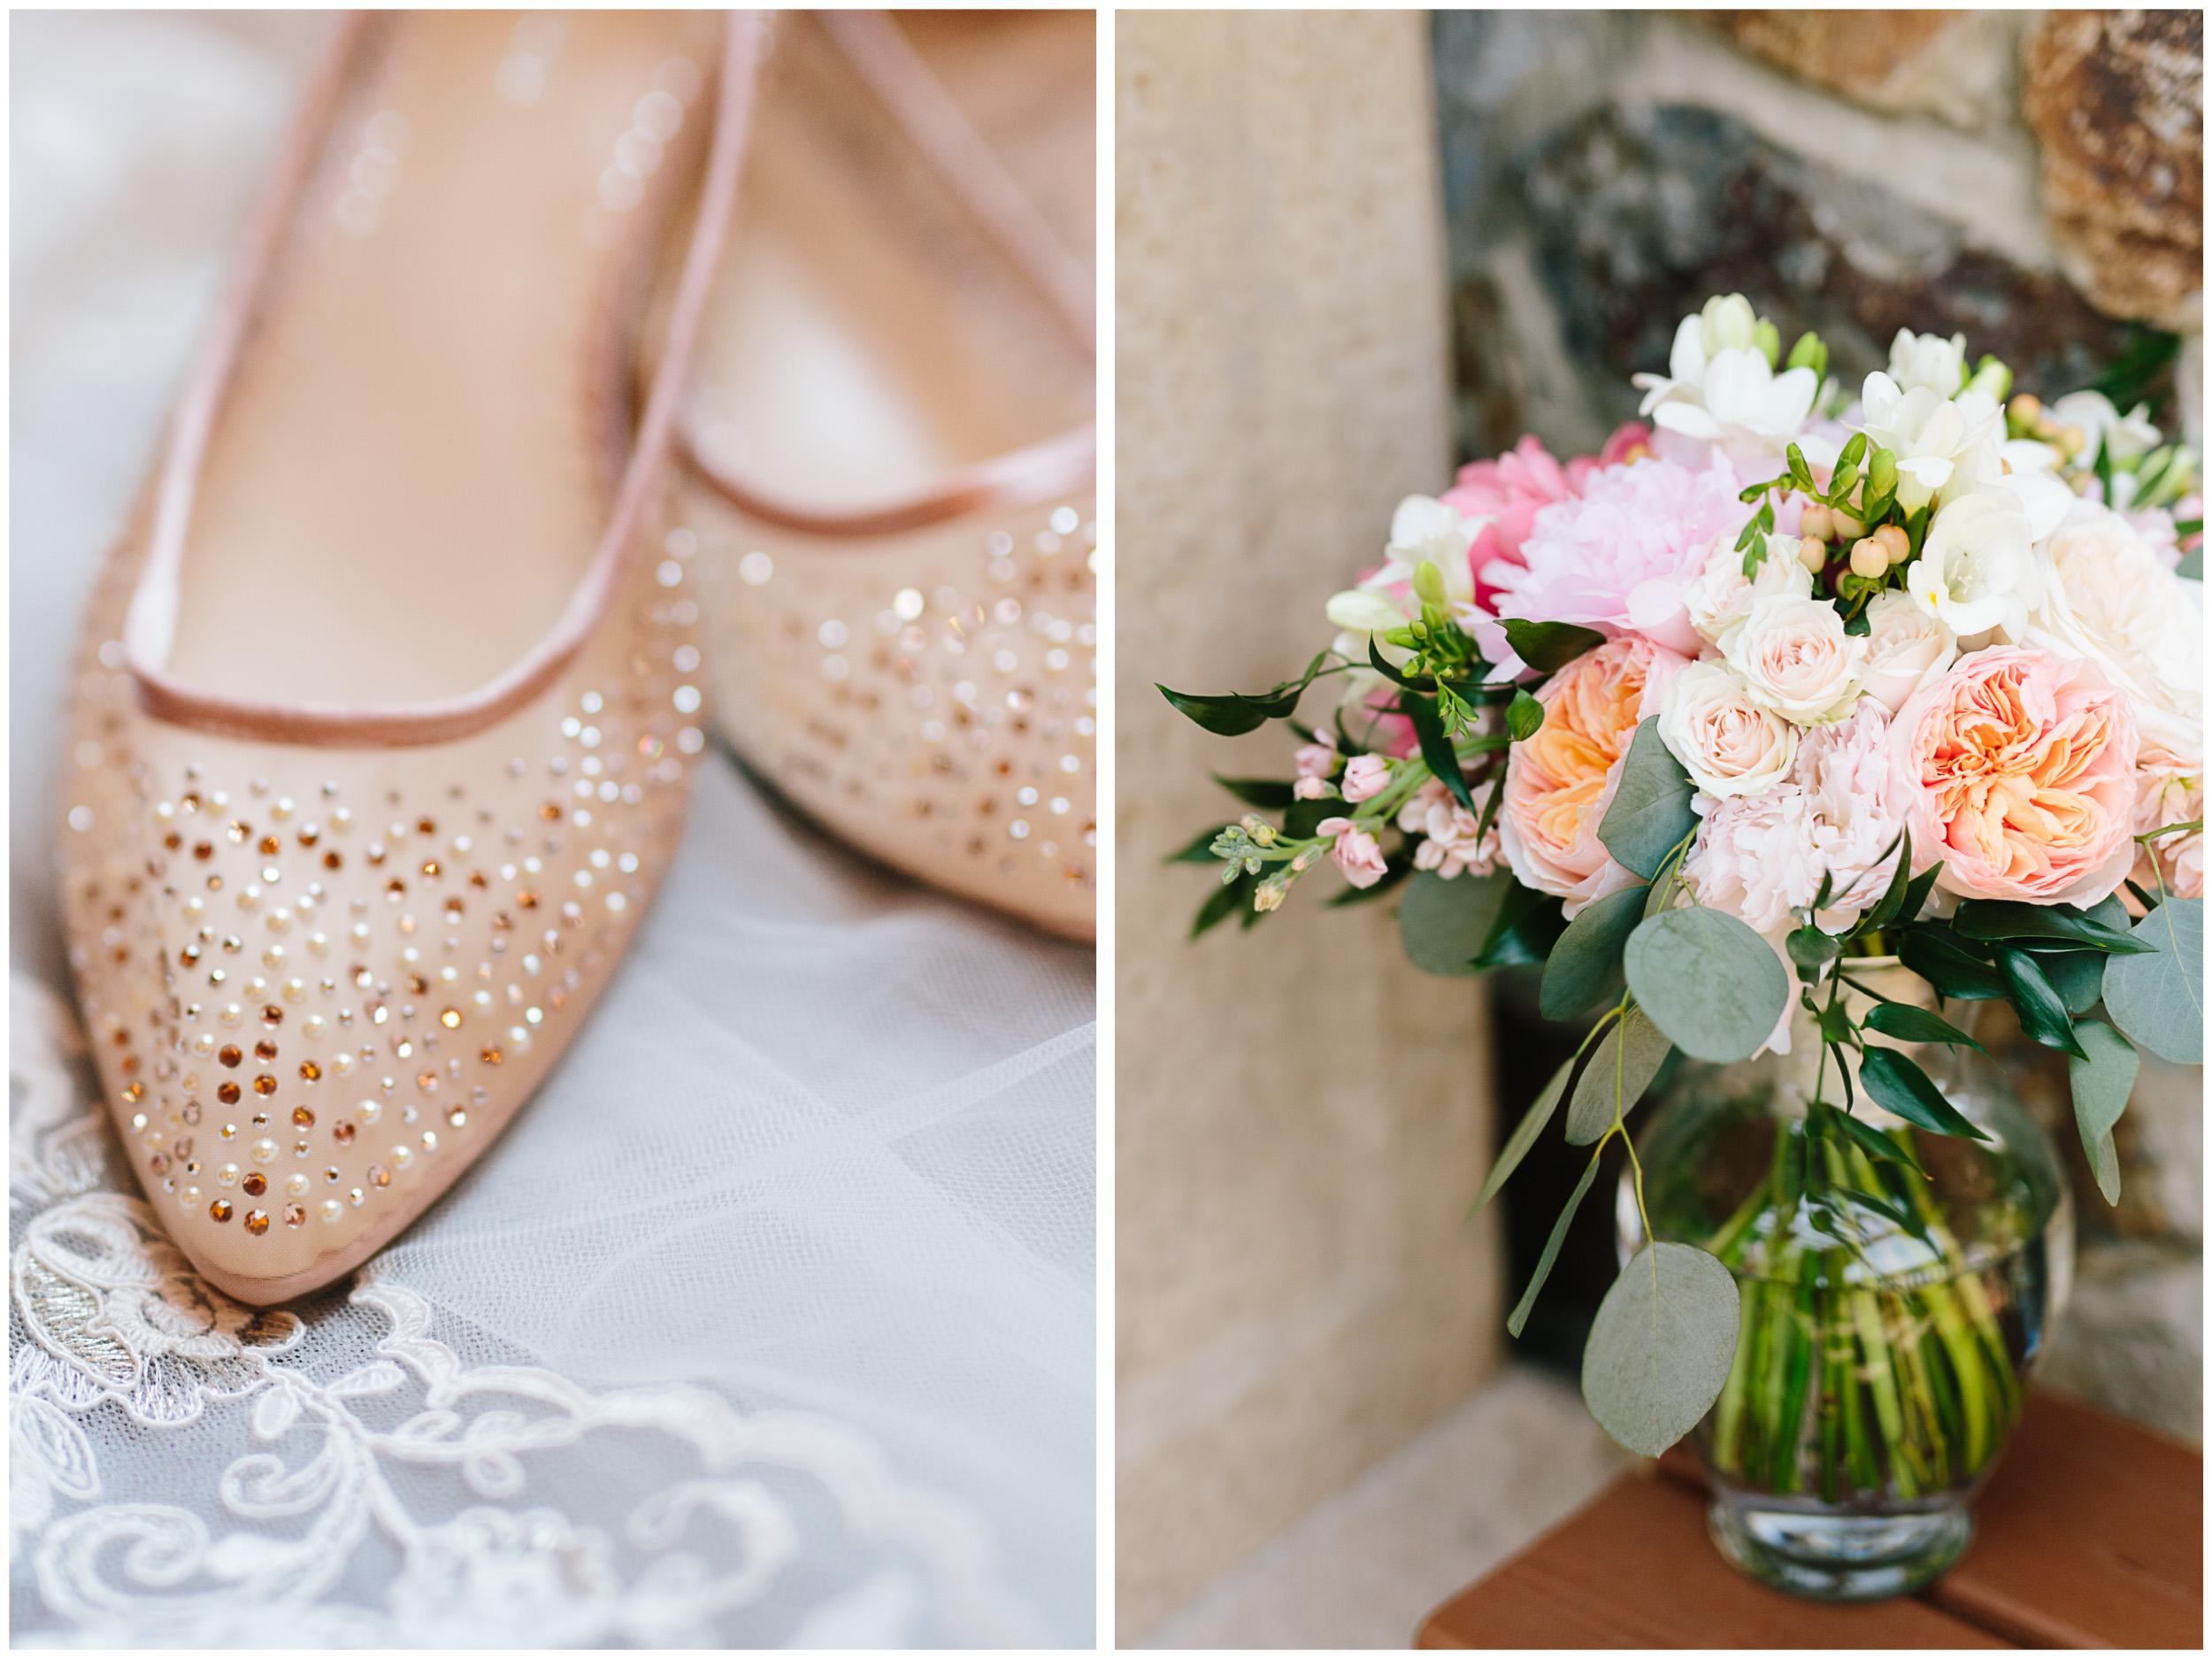 bella_collina_wedding_5.jpg